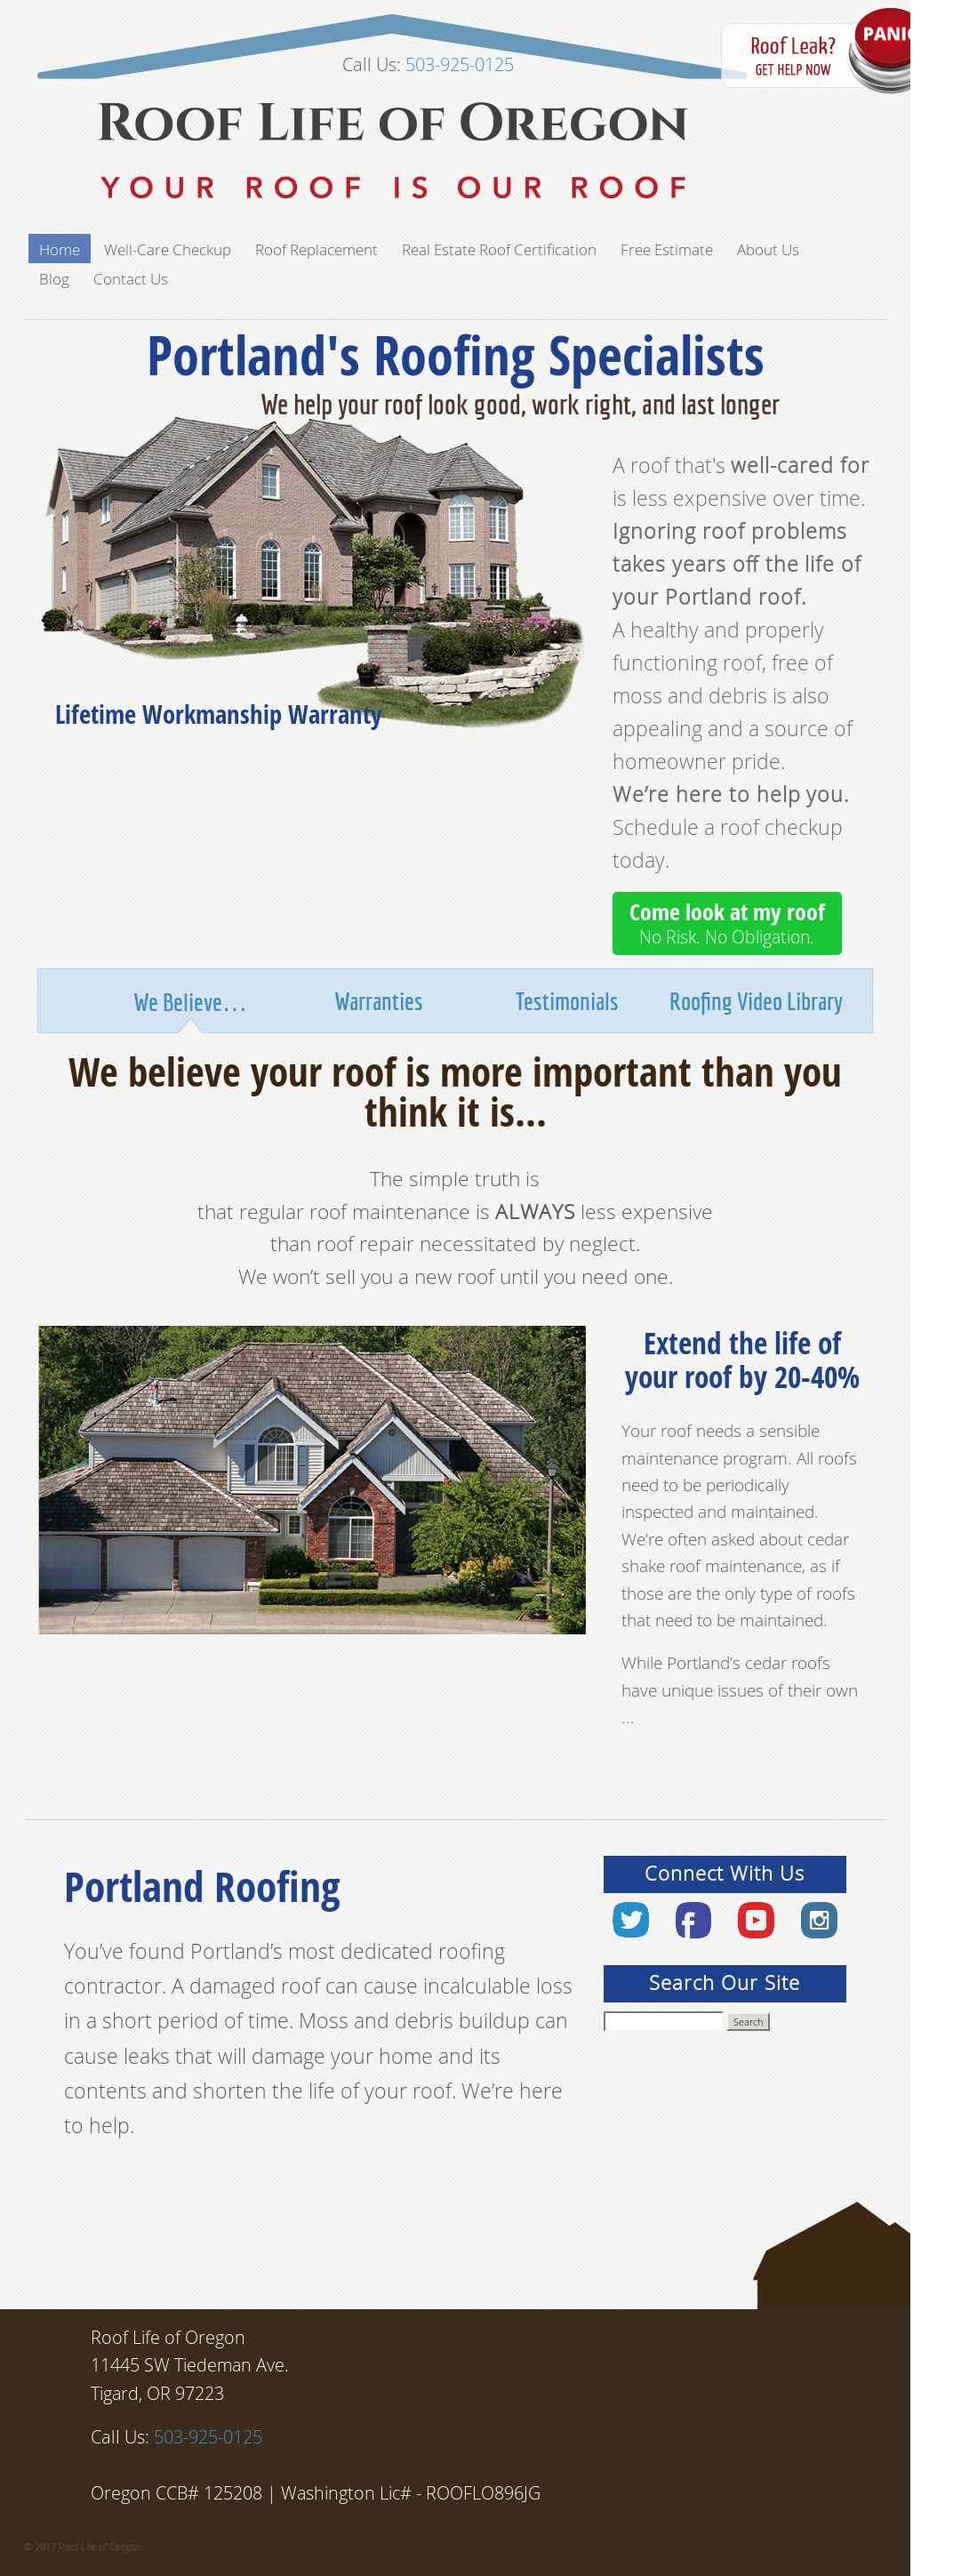 1st oregon exteriors website history - Roof Life Of Oregon